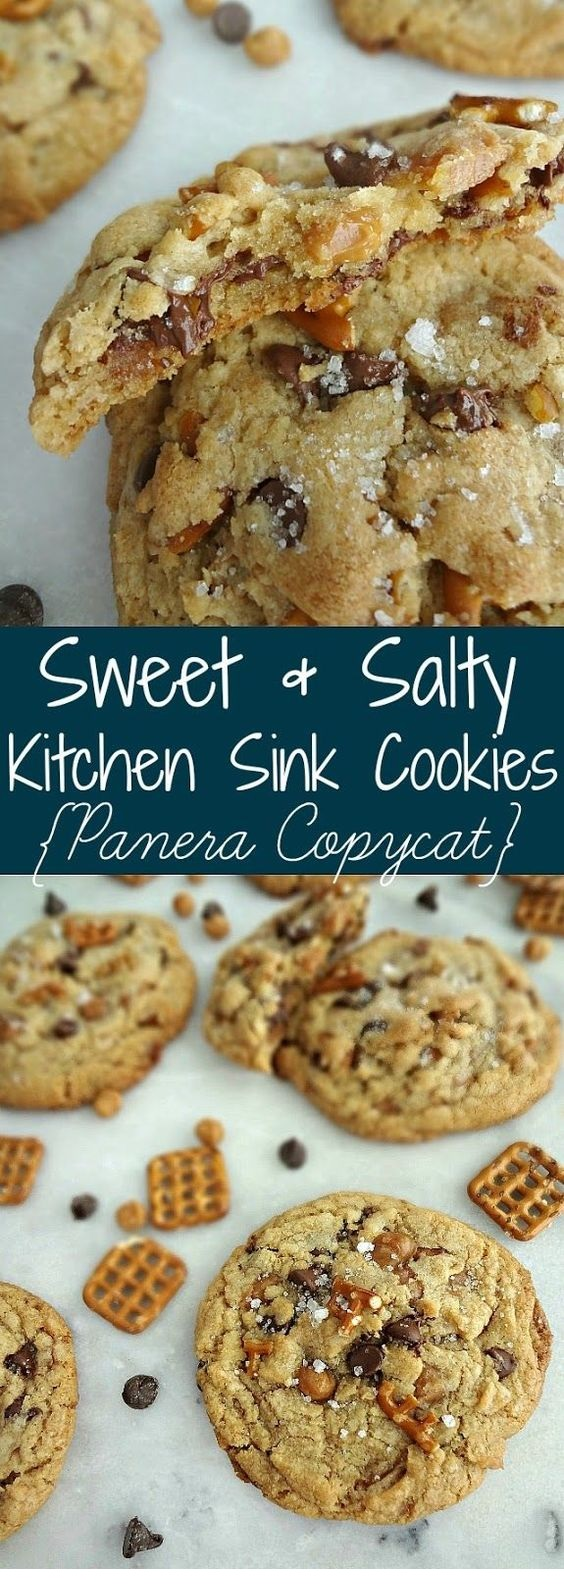 Sweet & Salty Kitchen Sink Cookies